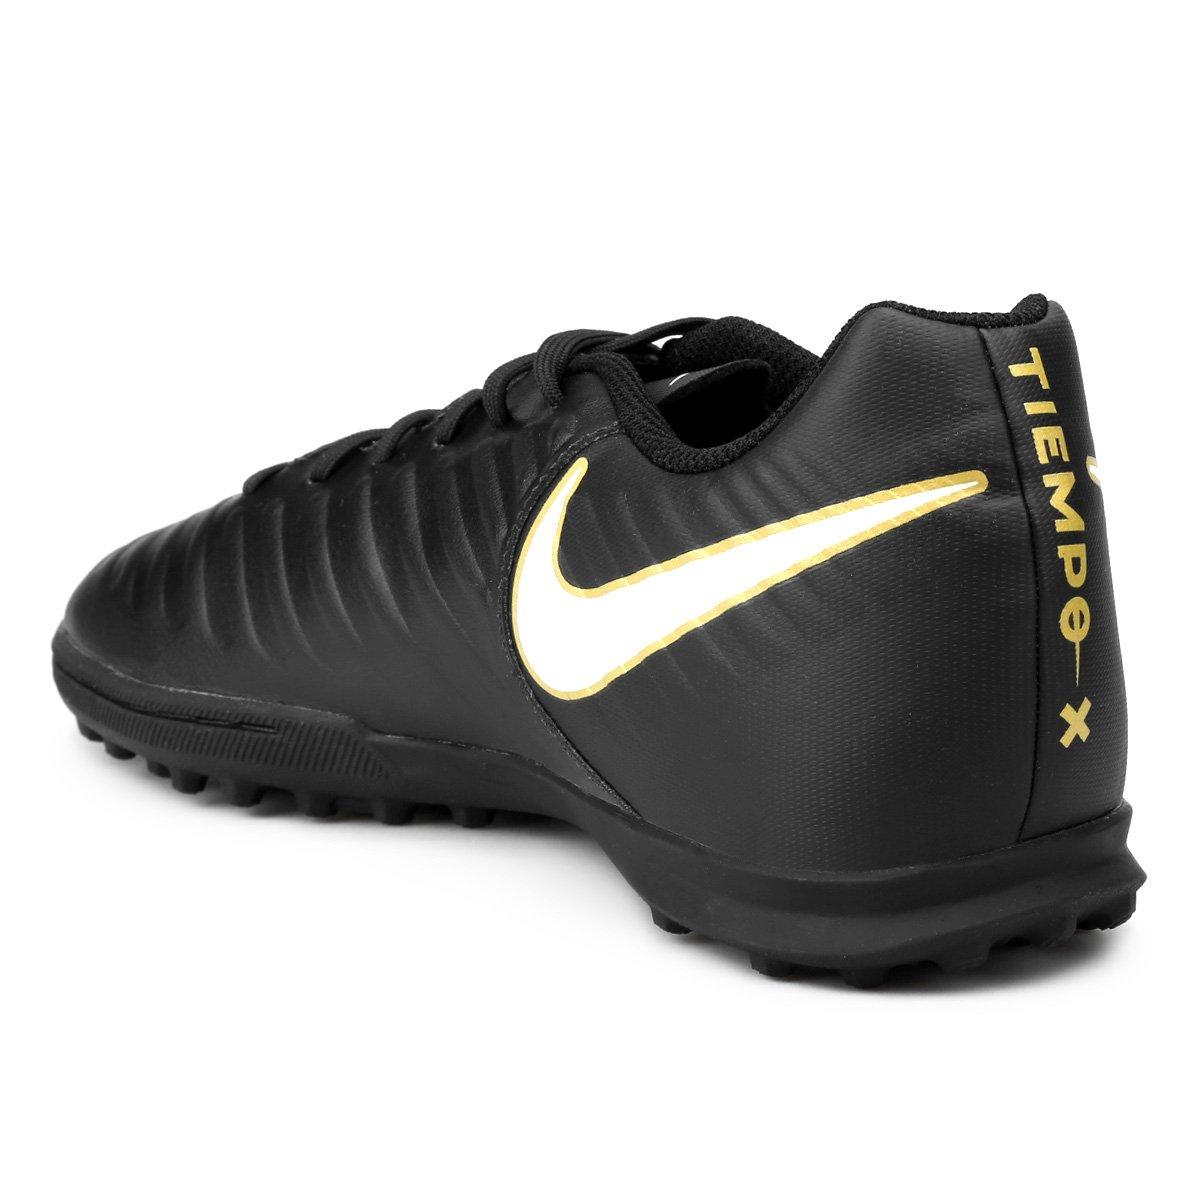 ce5d2f0c7f Chuteira Society Nike Tiempo Rio 4 TF